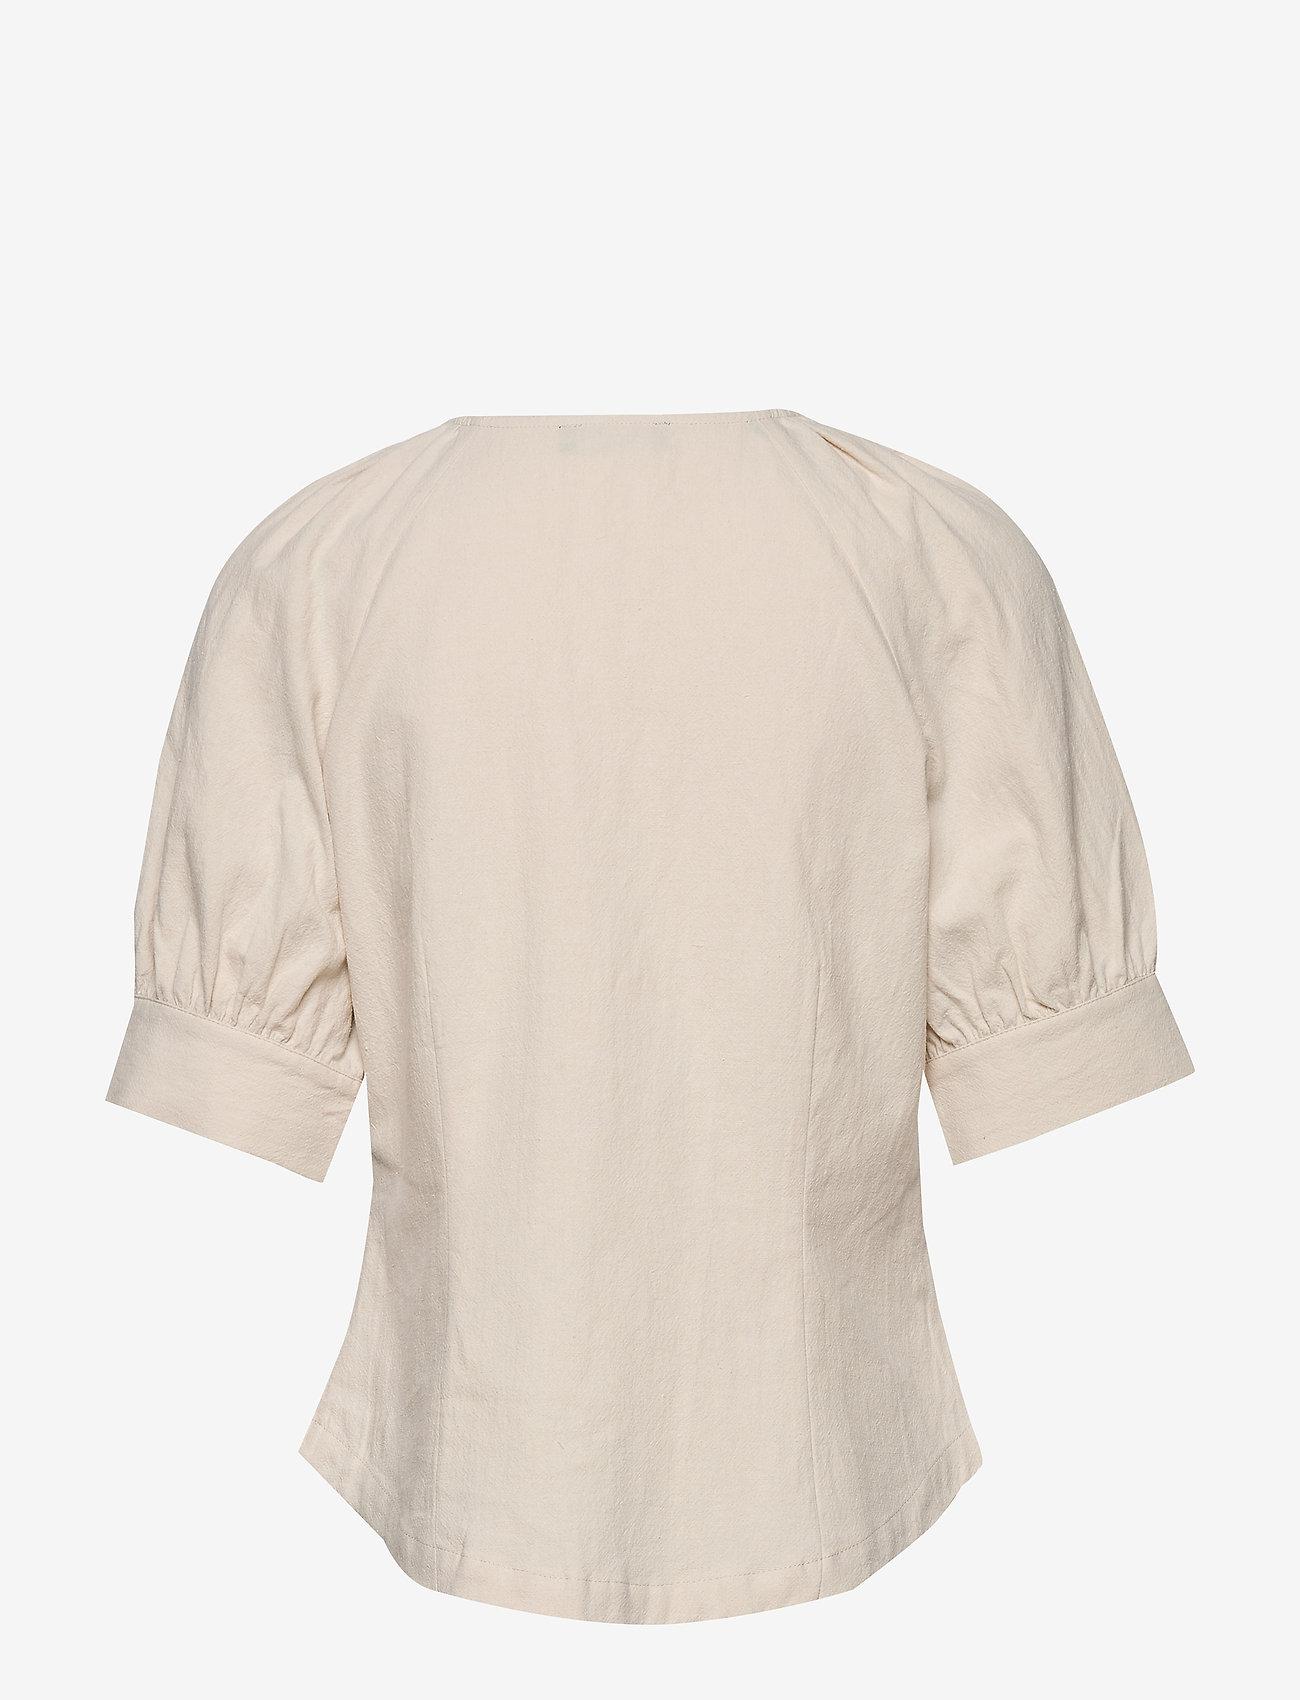 Selected Femme - SLFMALVINA 2/4 SHIRT - kurzämlige blusen - sandshell - 1